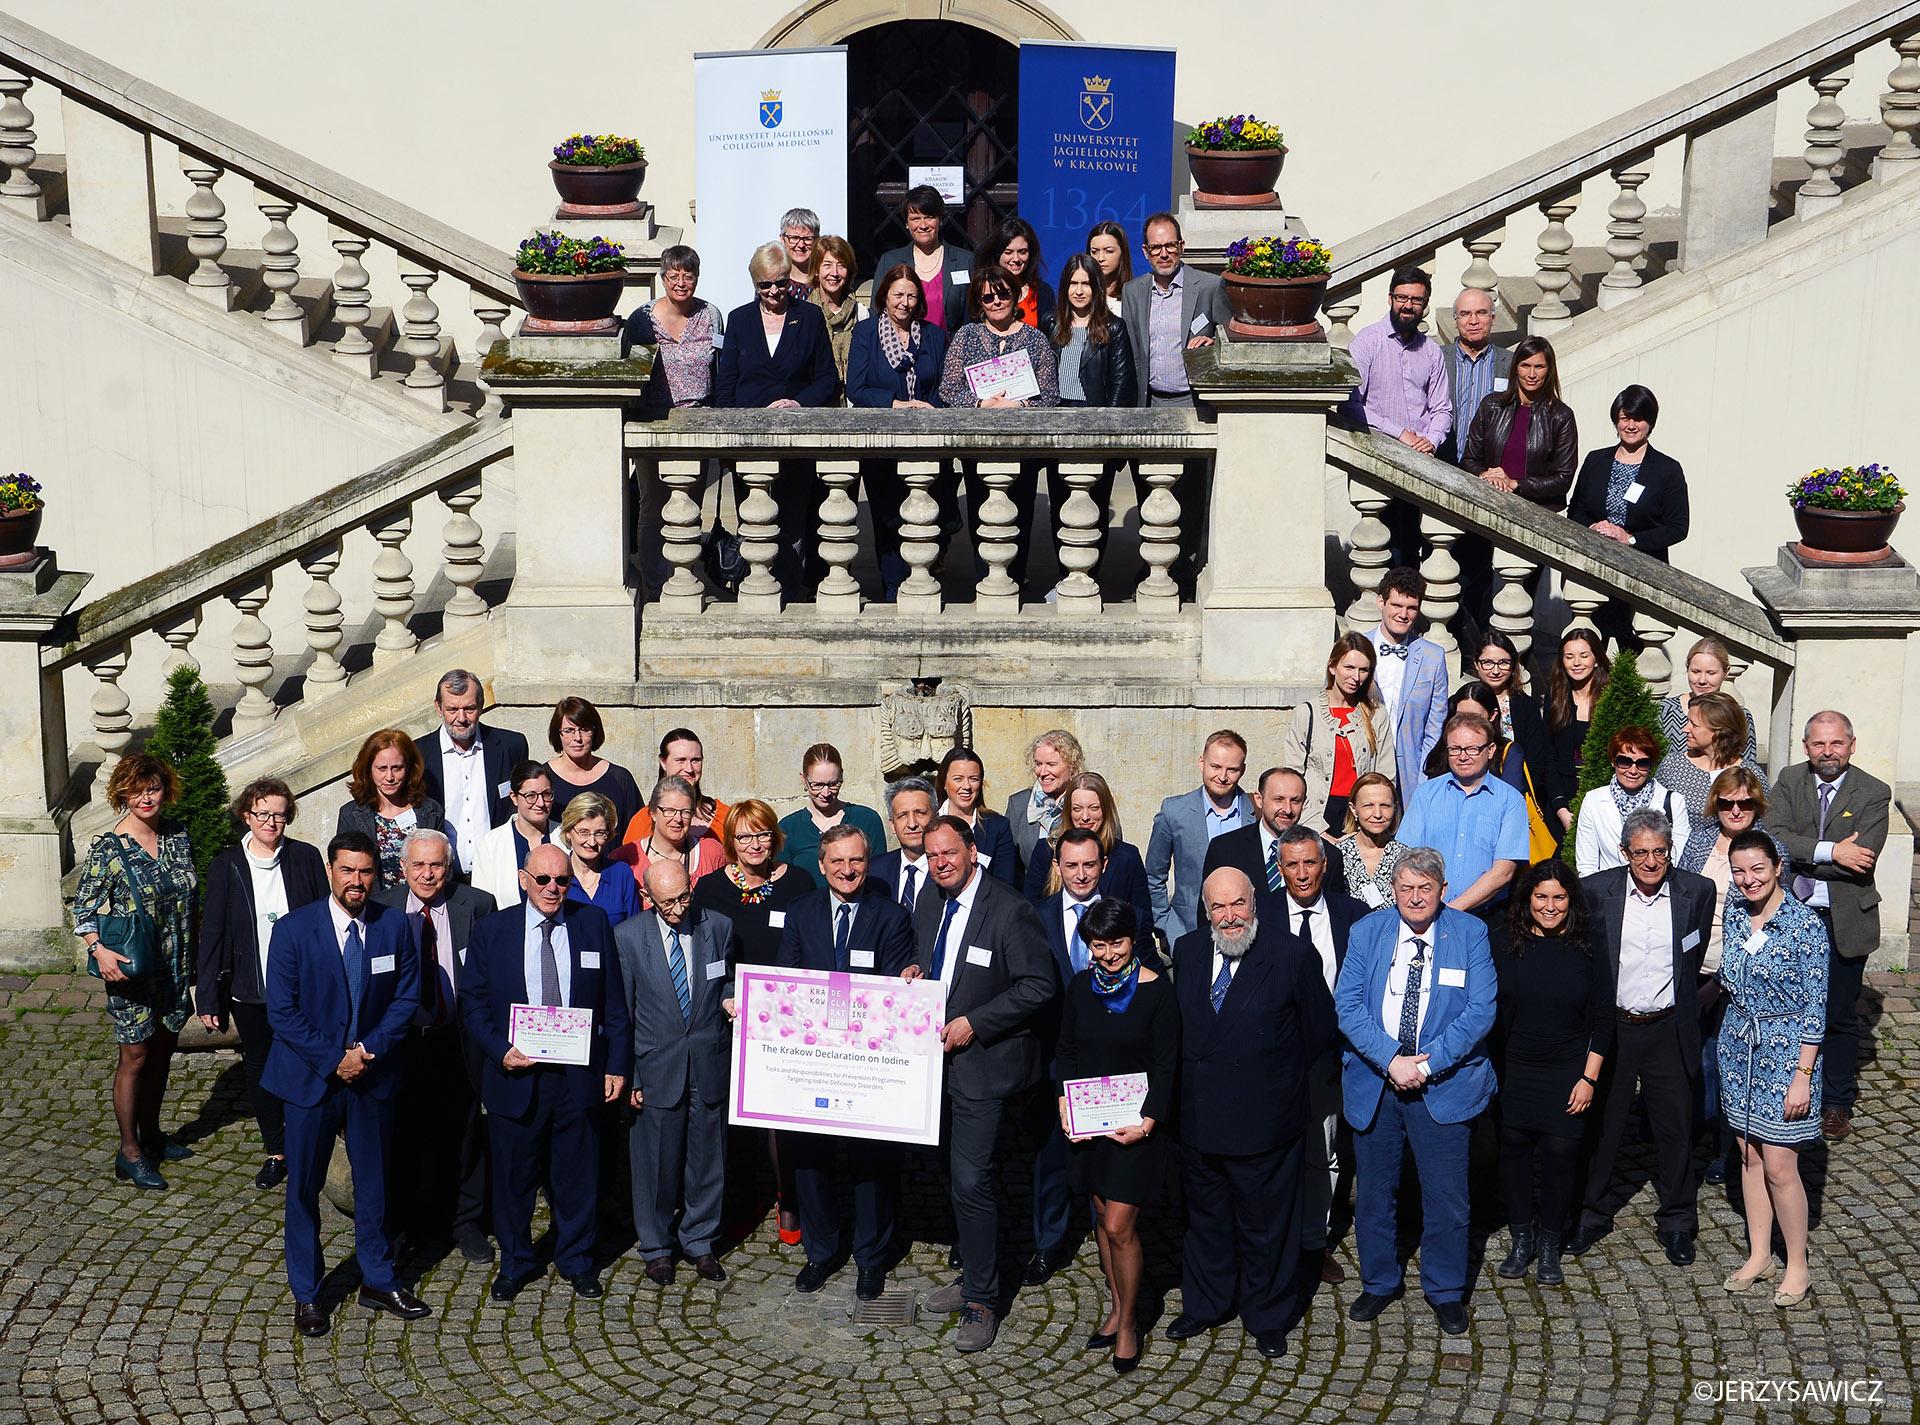 Krakow Declaration on Iodine presentation meeting